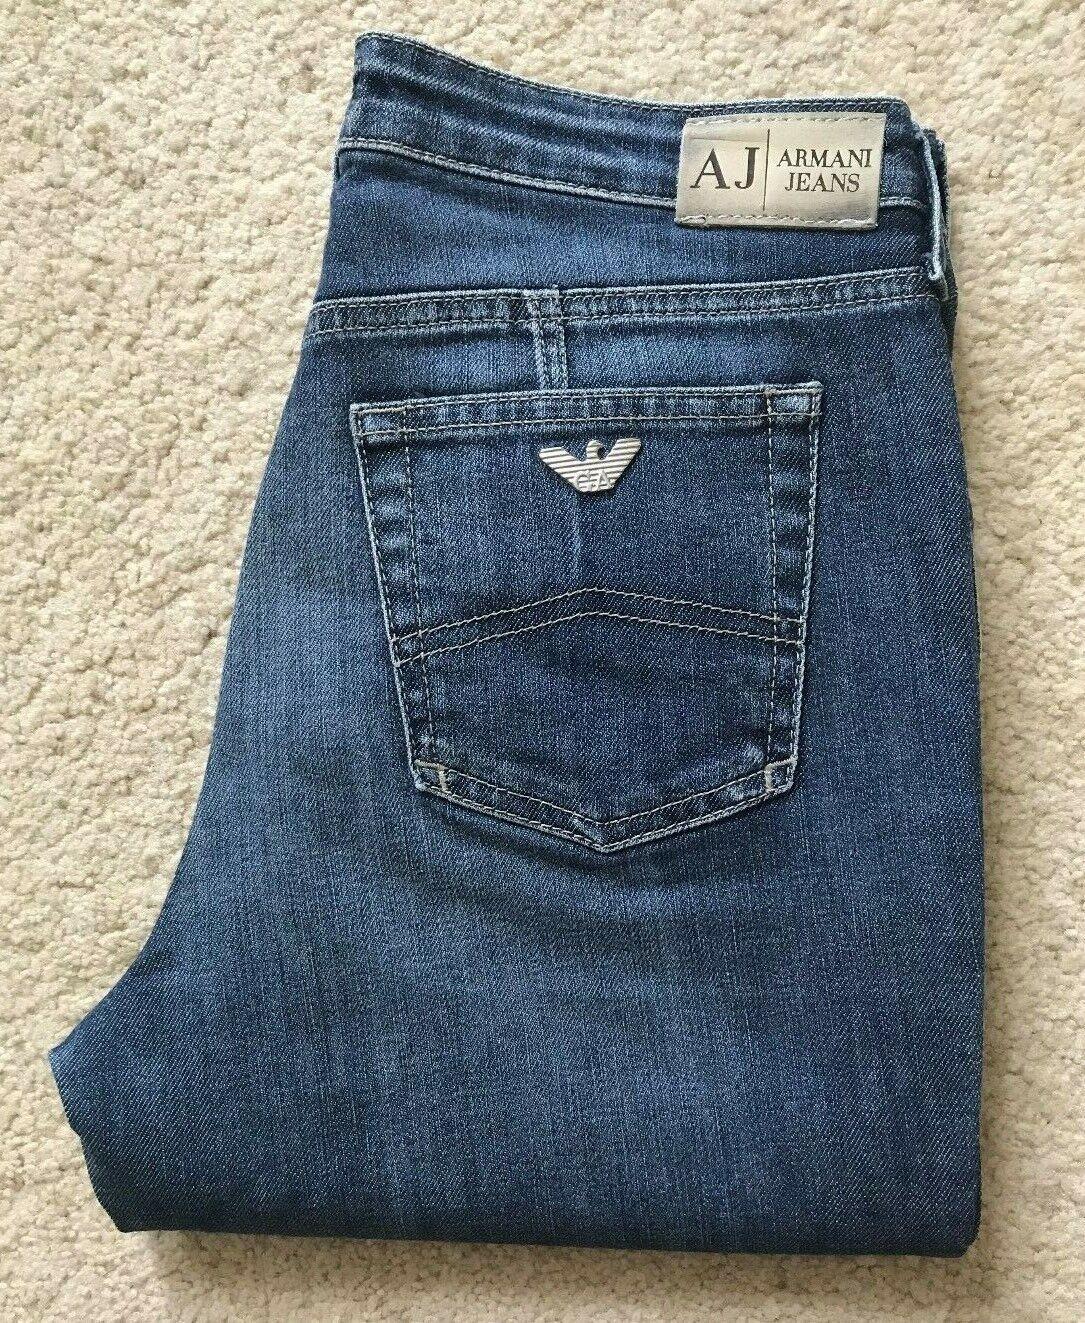 Armani 007 Series indigo bluee bootcut vintage denim jeans W 30 L 34